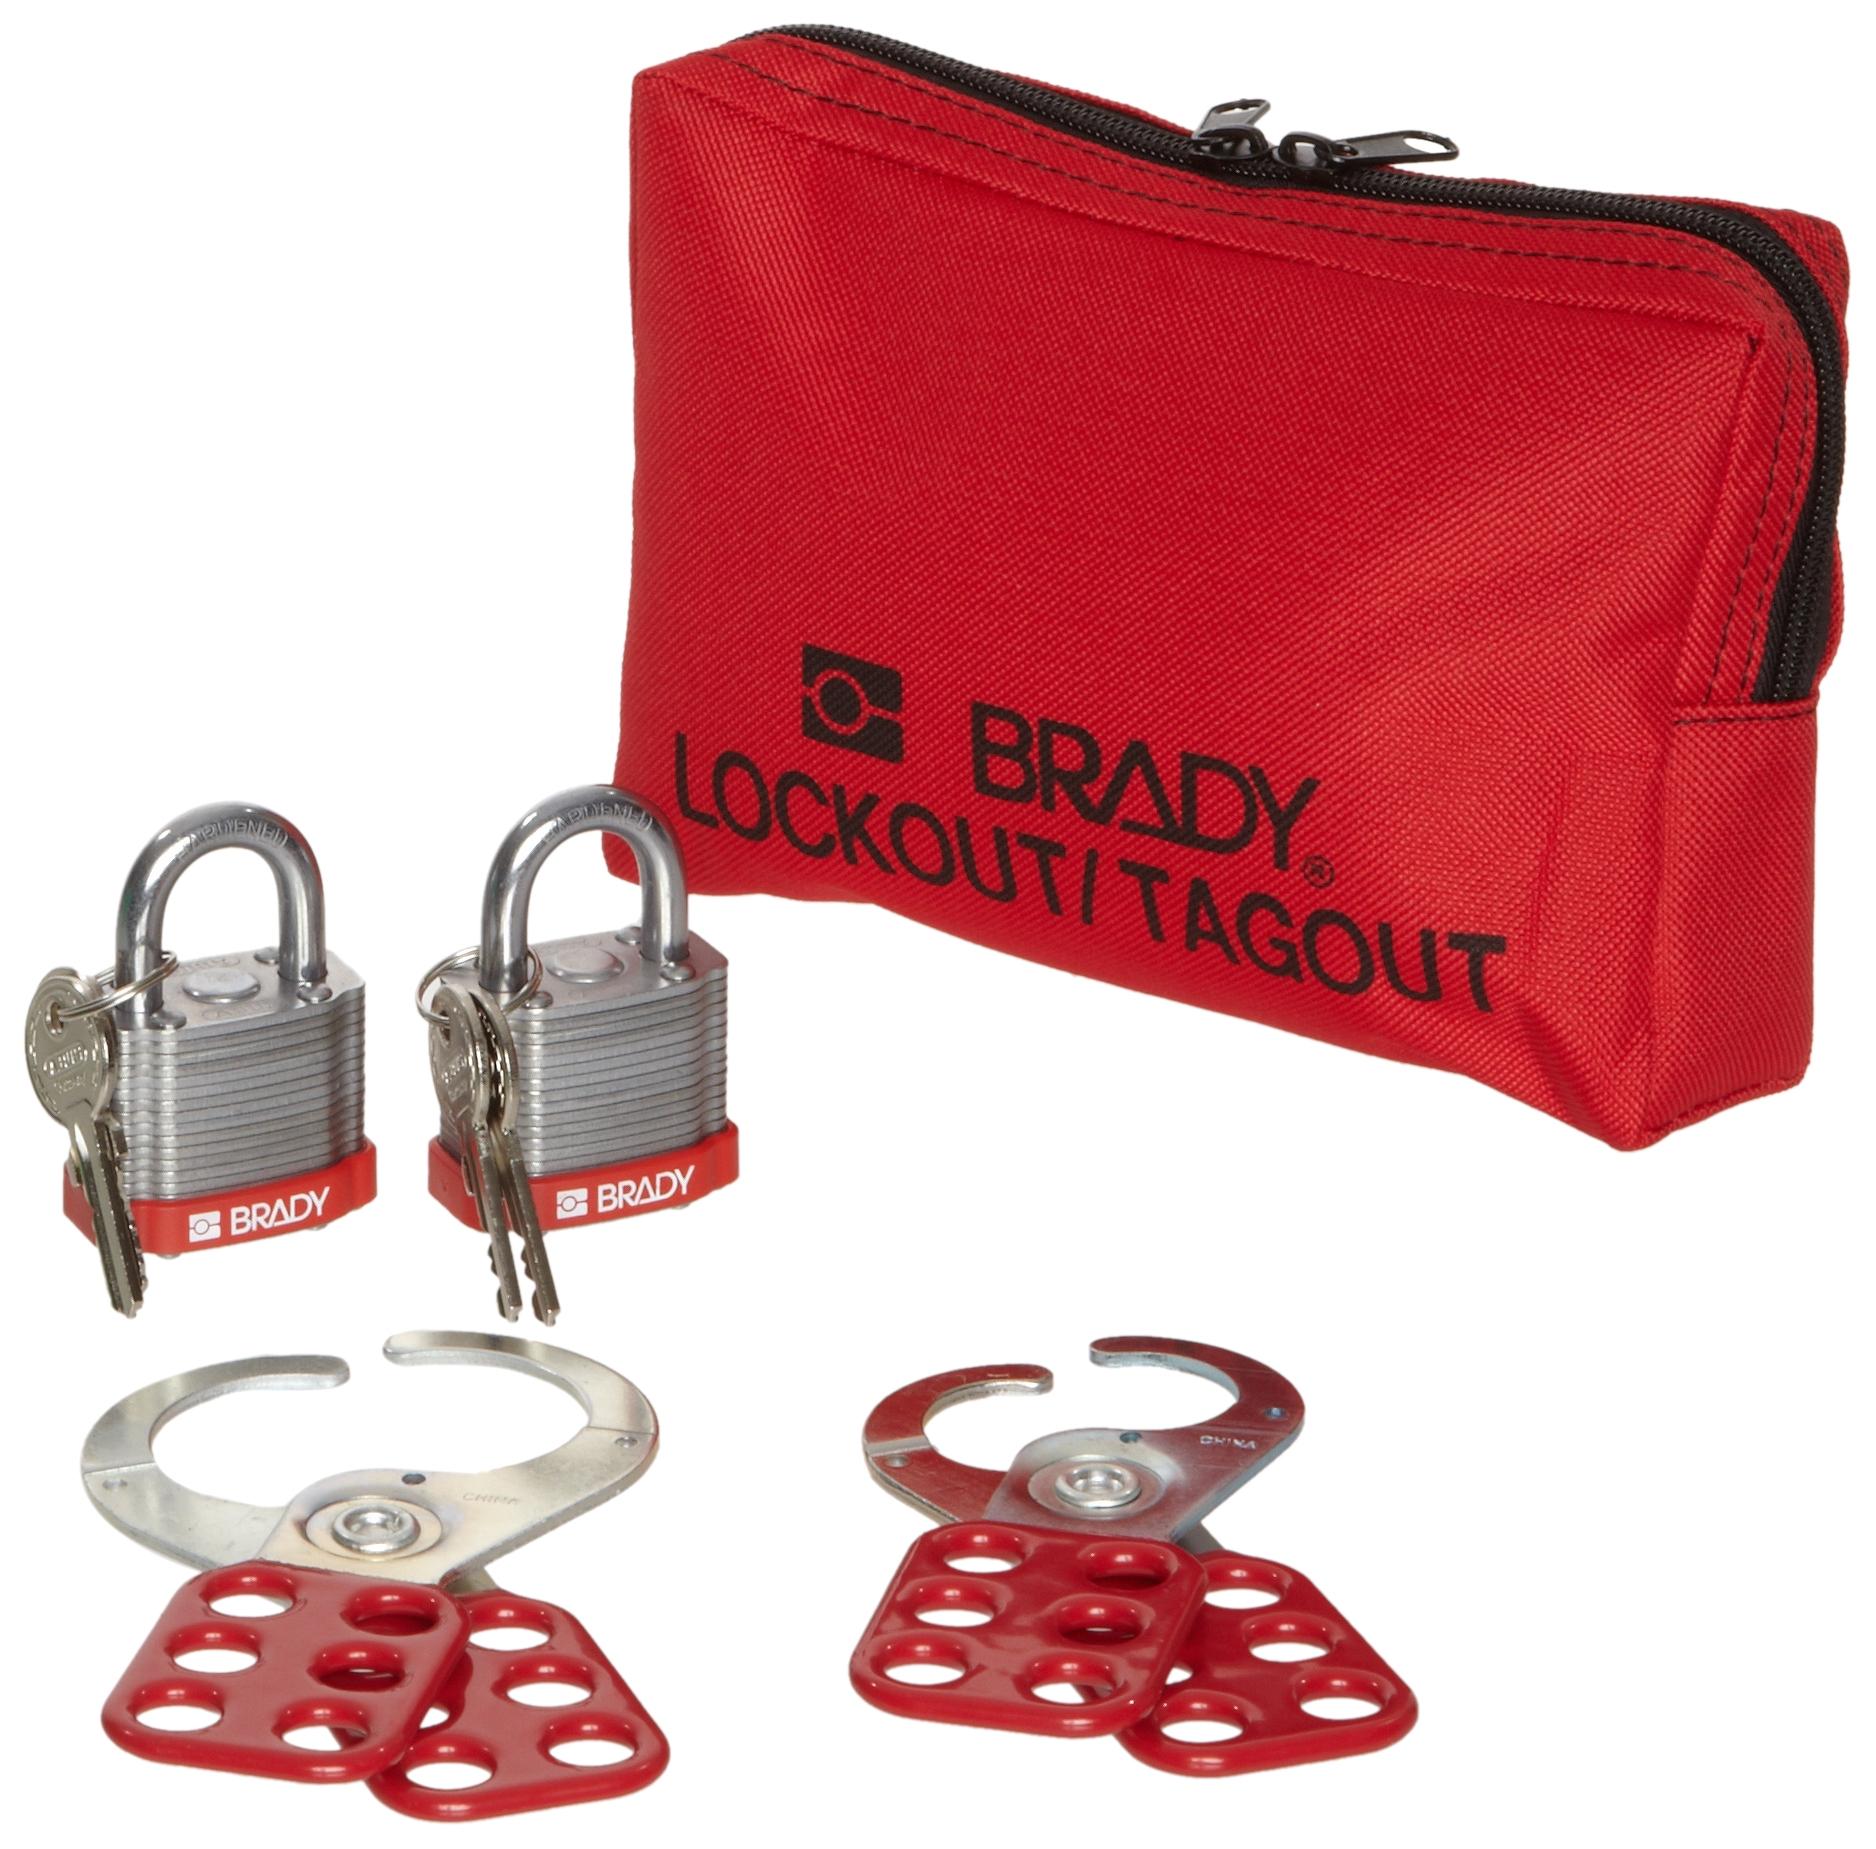 Brady Personal Lockout Pouch, Includes 2 Steel Padlocks